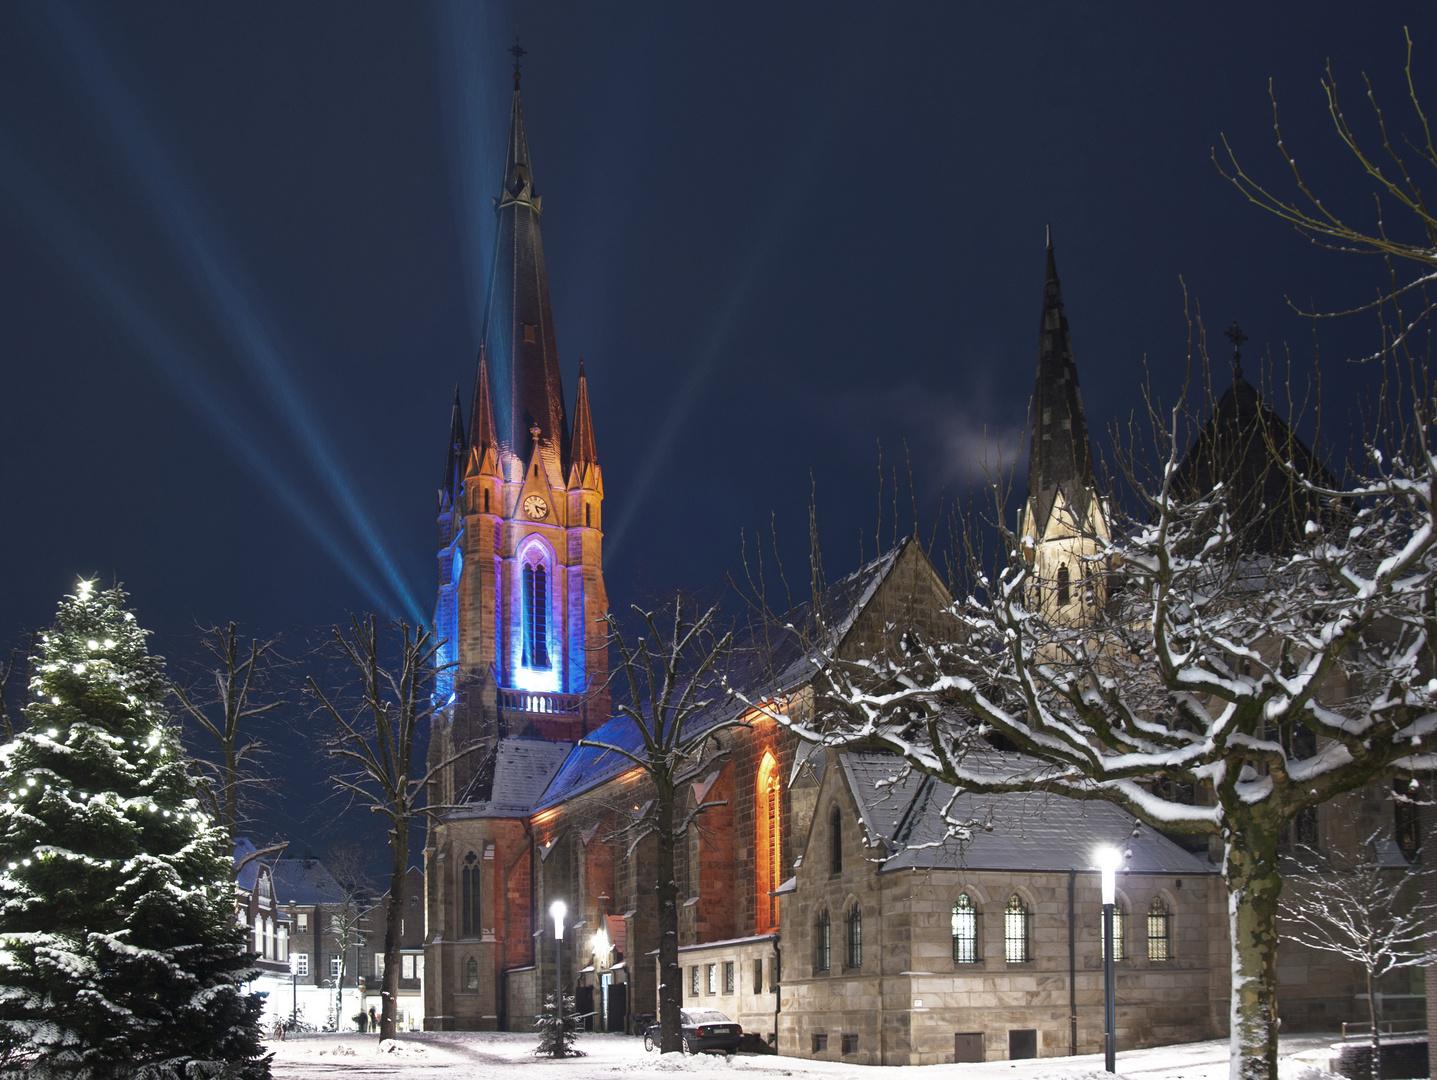 Emsdetten Pankratiuskirche